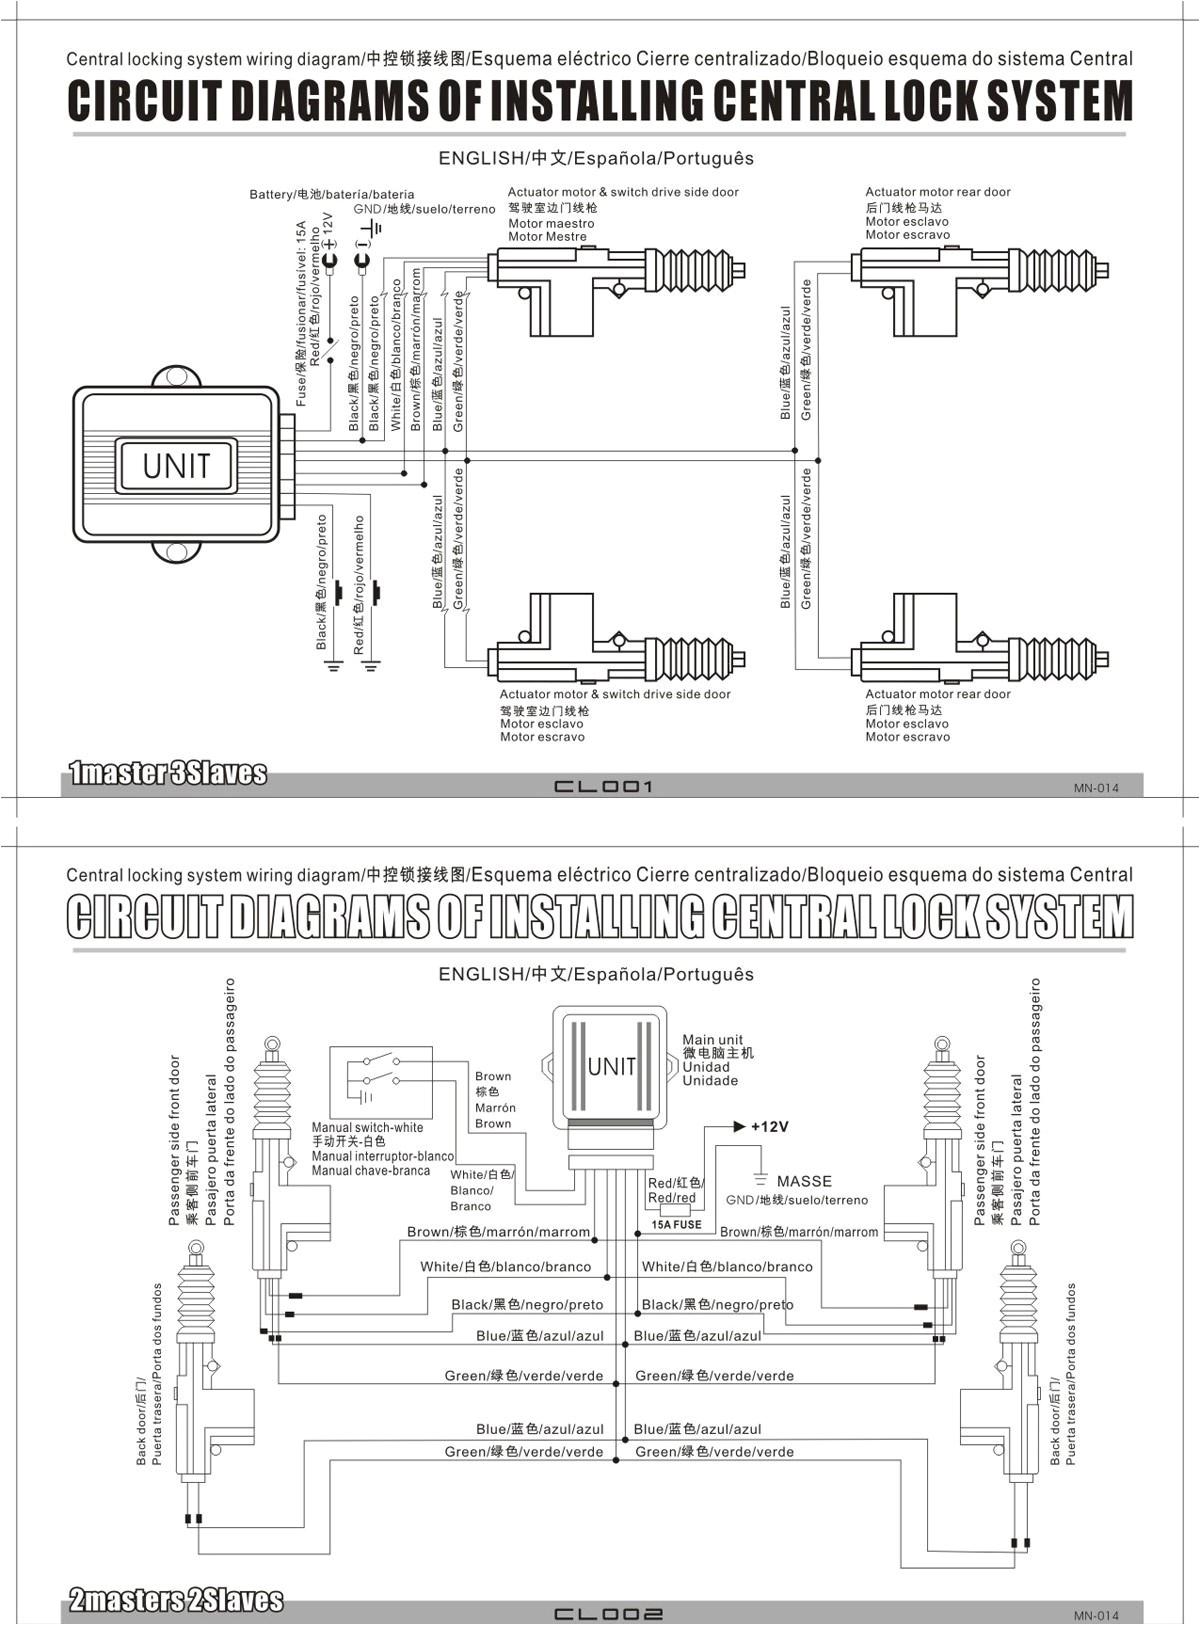 5 Wire Central Locking Actuator Wiring Diagram Wiring Diagram Nmax 8 Yamaha Fresh 5 Wire Central Locking Actuator